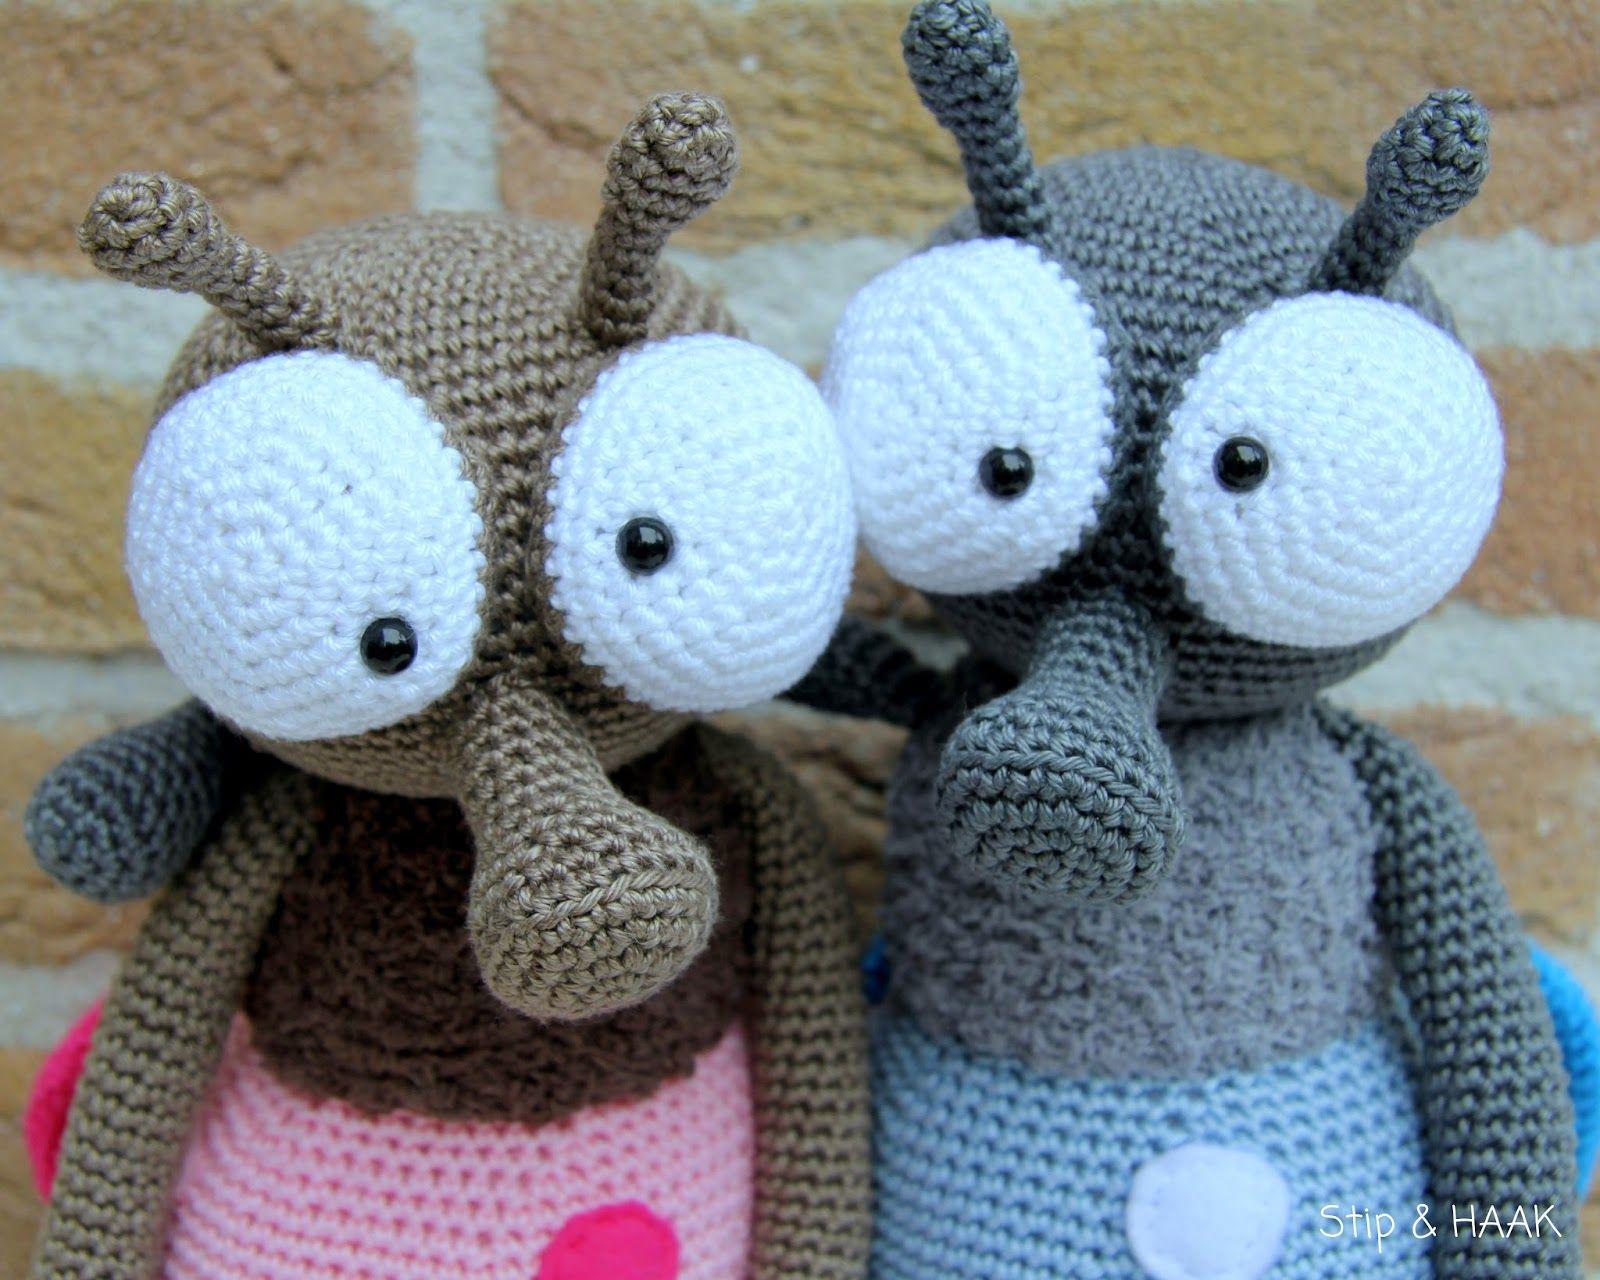 Stip & HAAK, #amigurumi #crochet | Amigurumi | Pinterest | Amigurumi ...